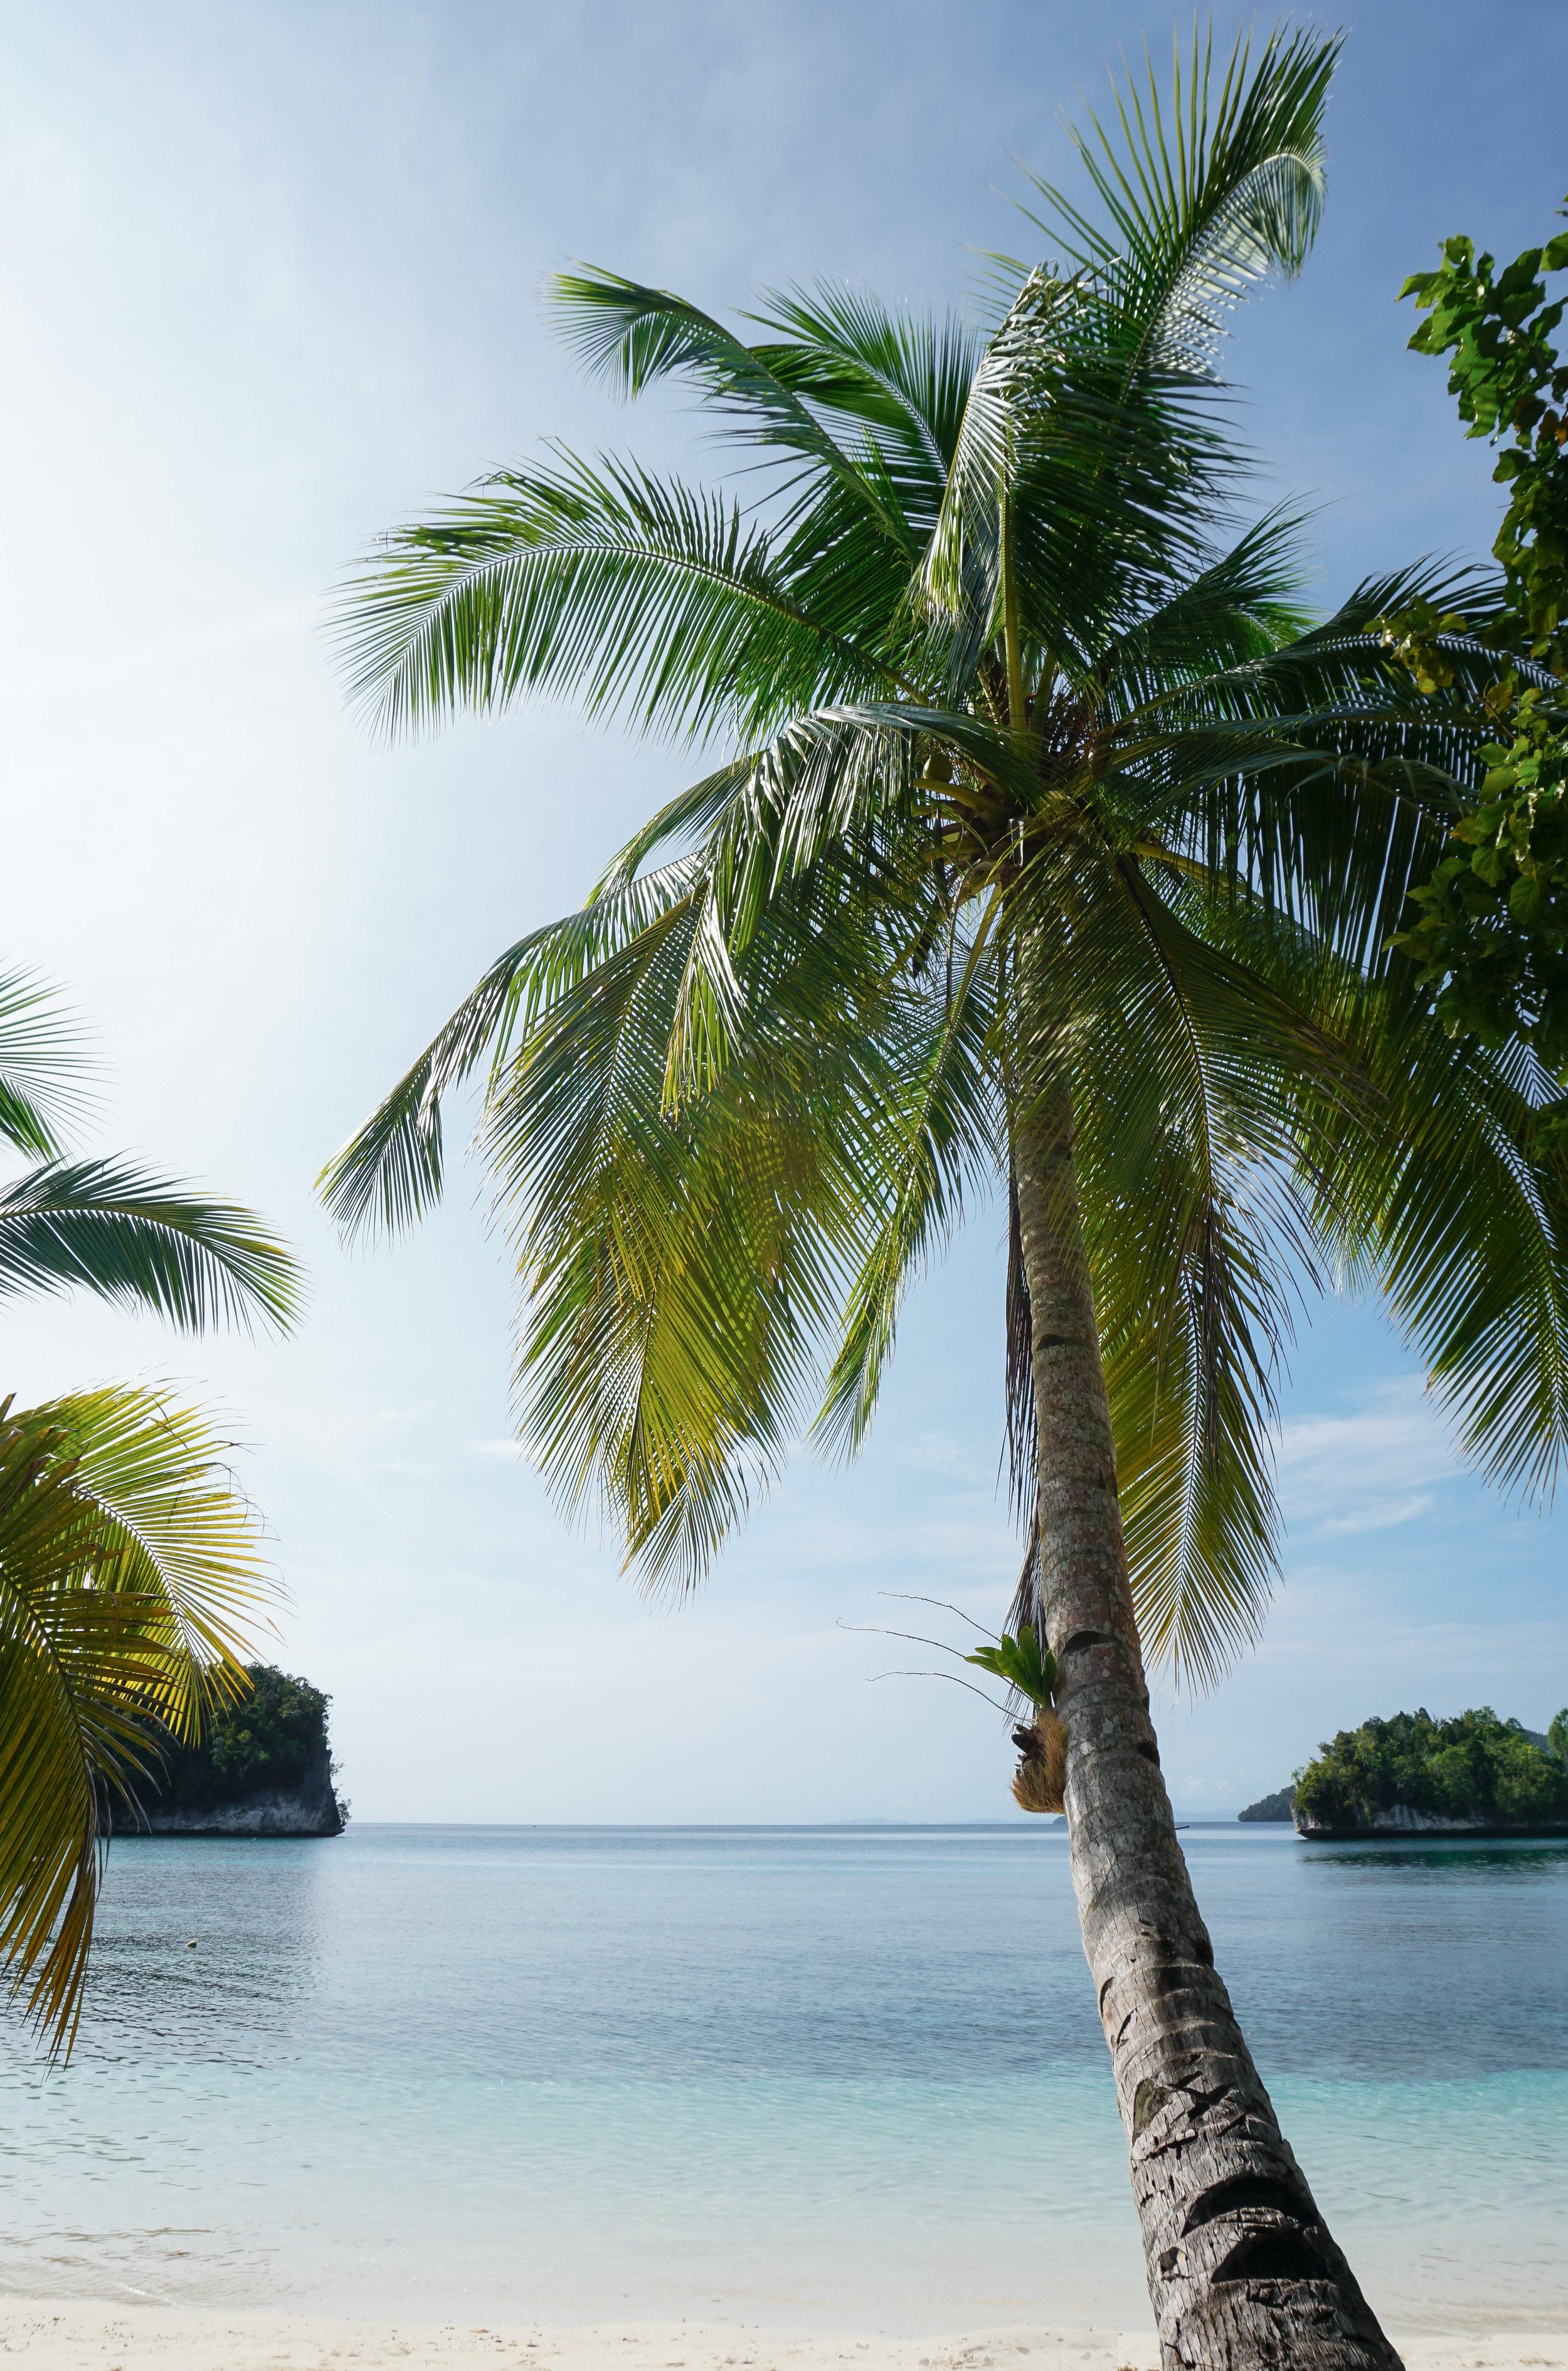 curio.trips.indonesia.raja.ampat.private.island.beach.palm.tree.portrait.jpg